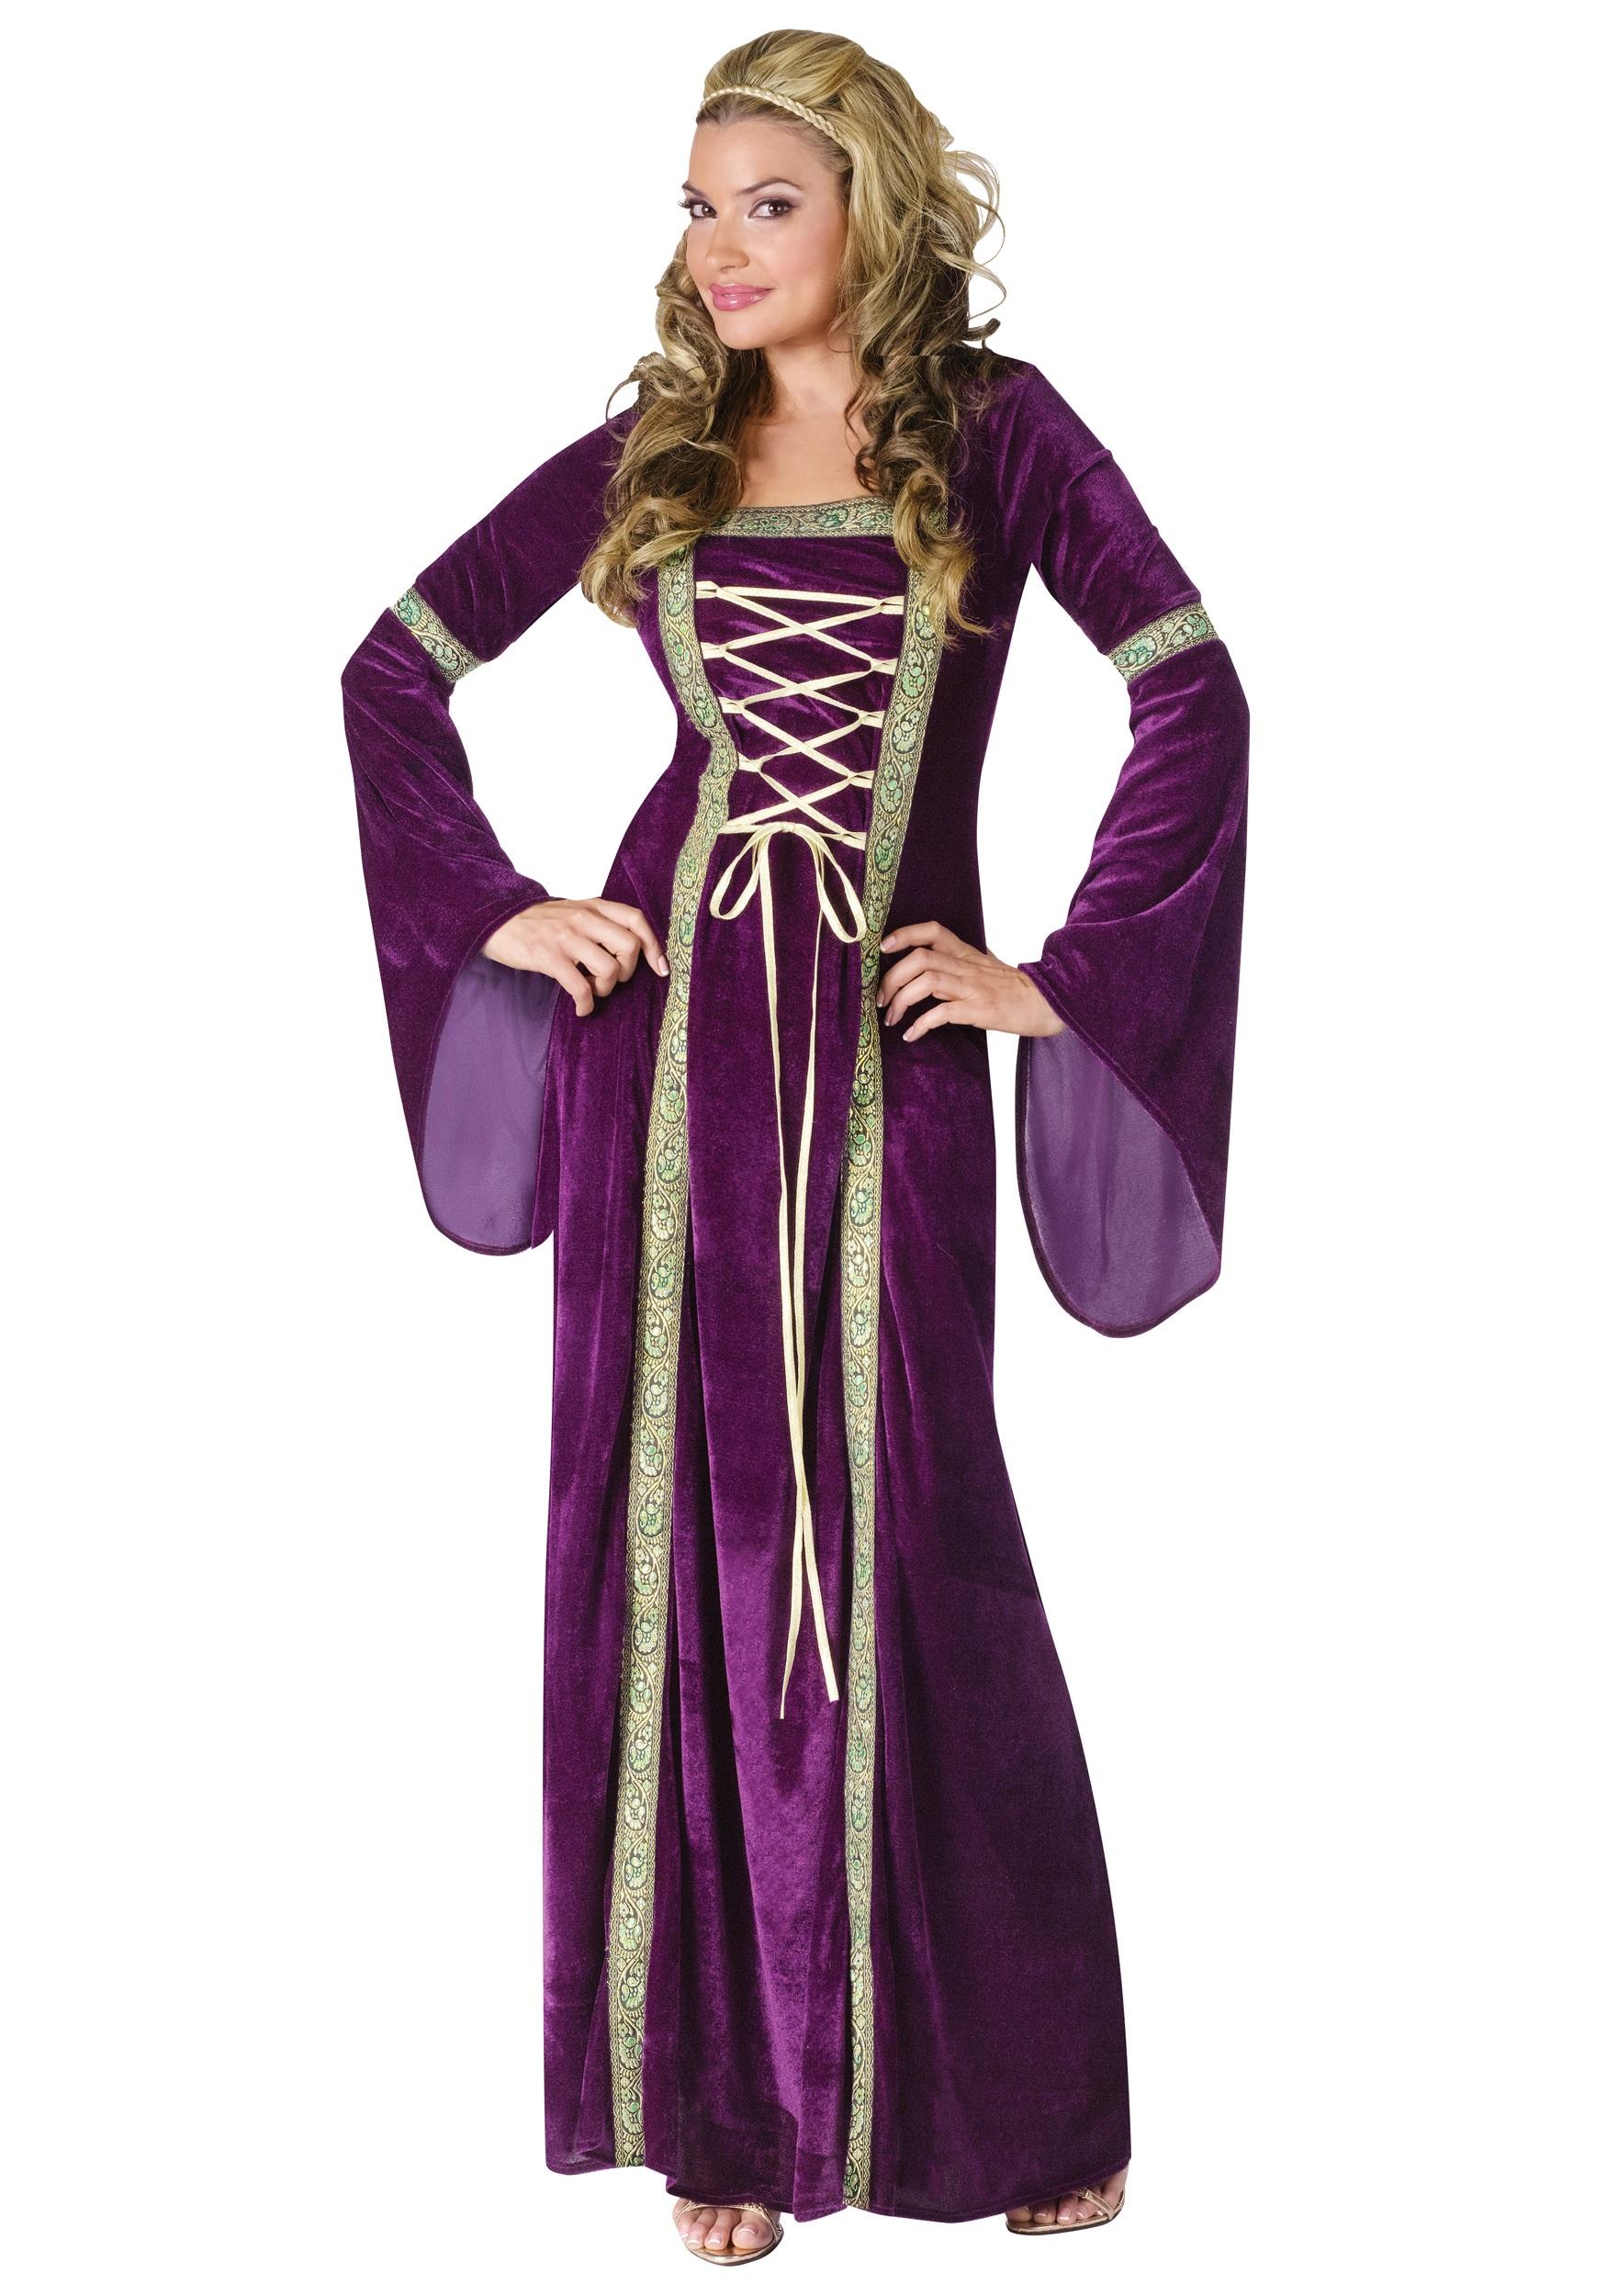 sc 1 st  Halloween Costumes & Renaissance Lady Costume